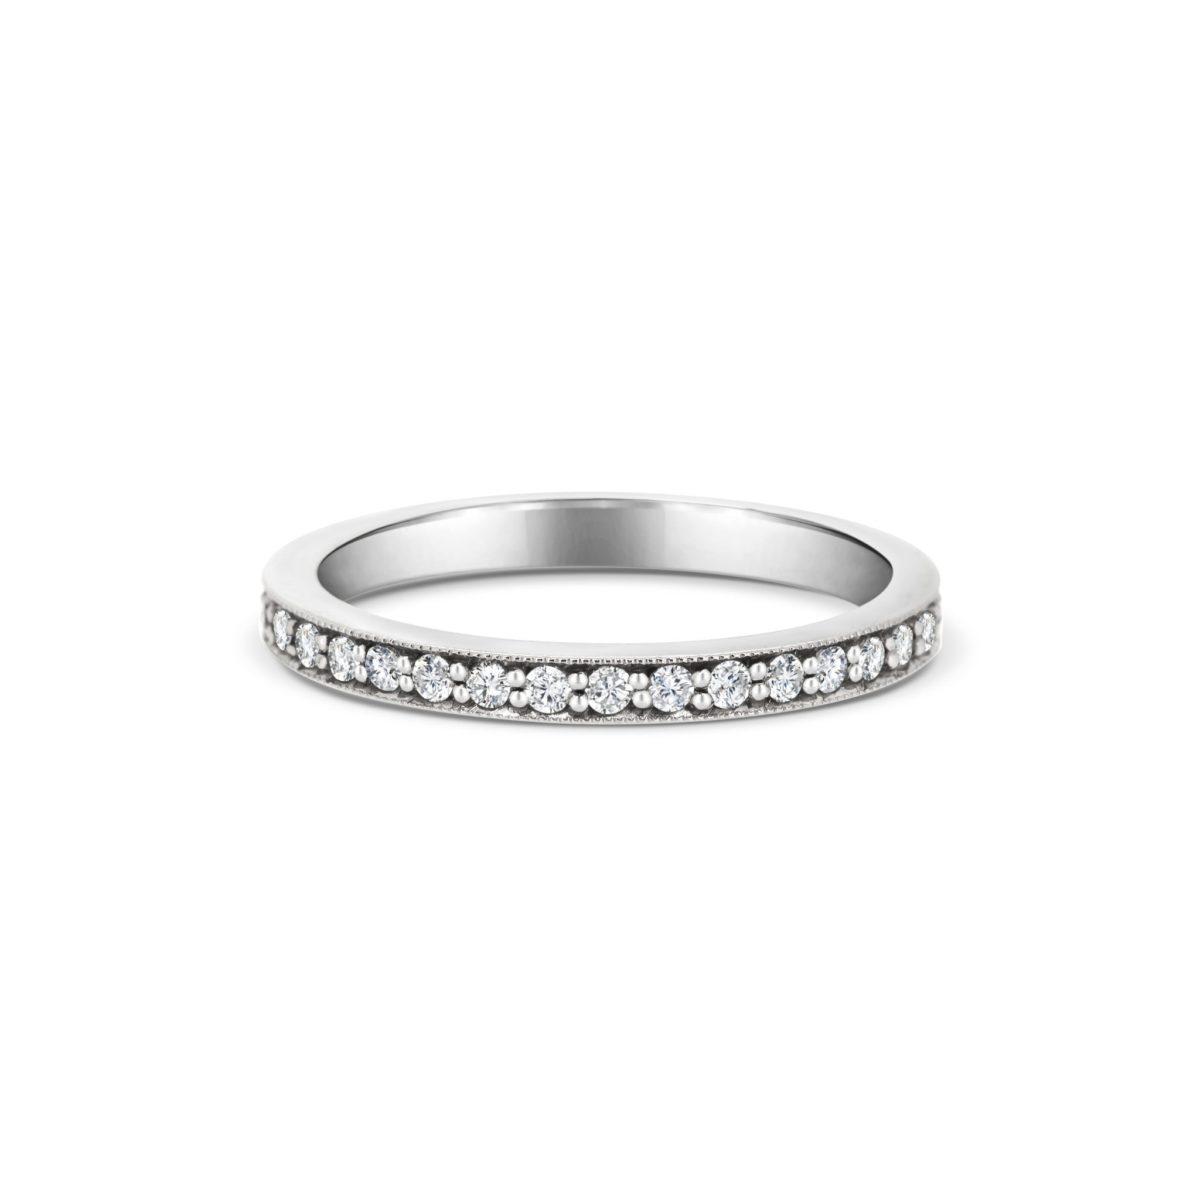 Rachel Round Cut Diamond Thread Milgrain Wedding Band